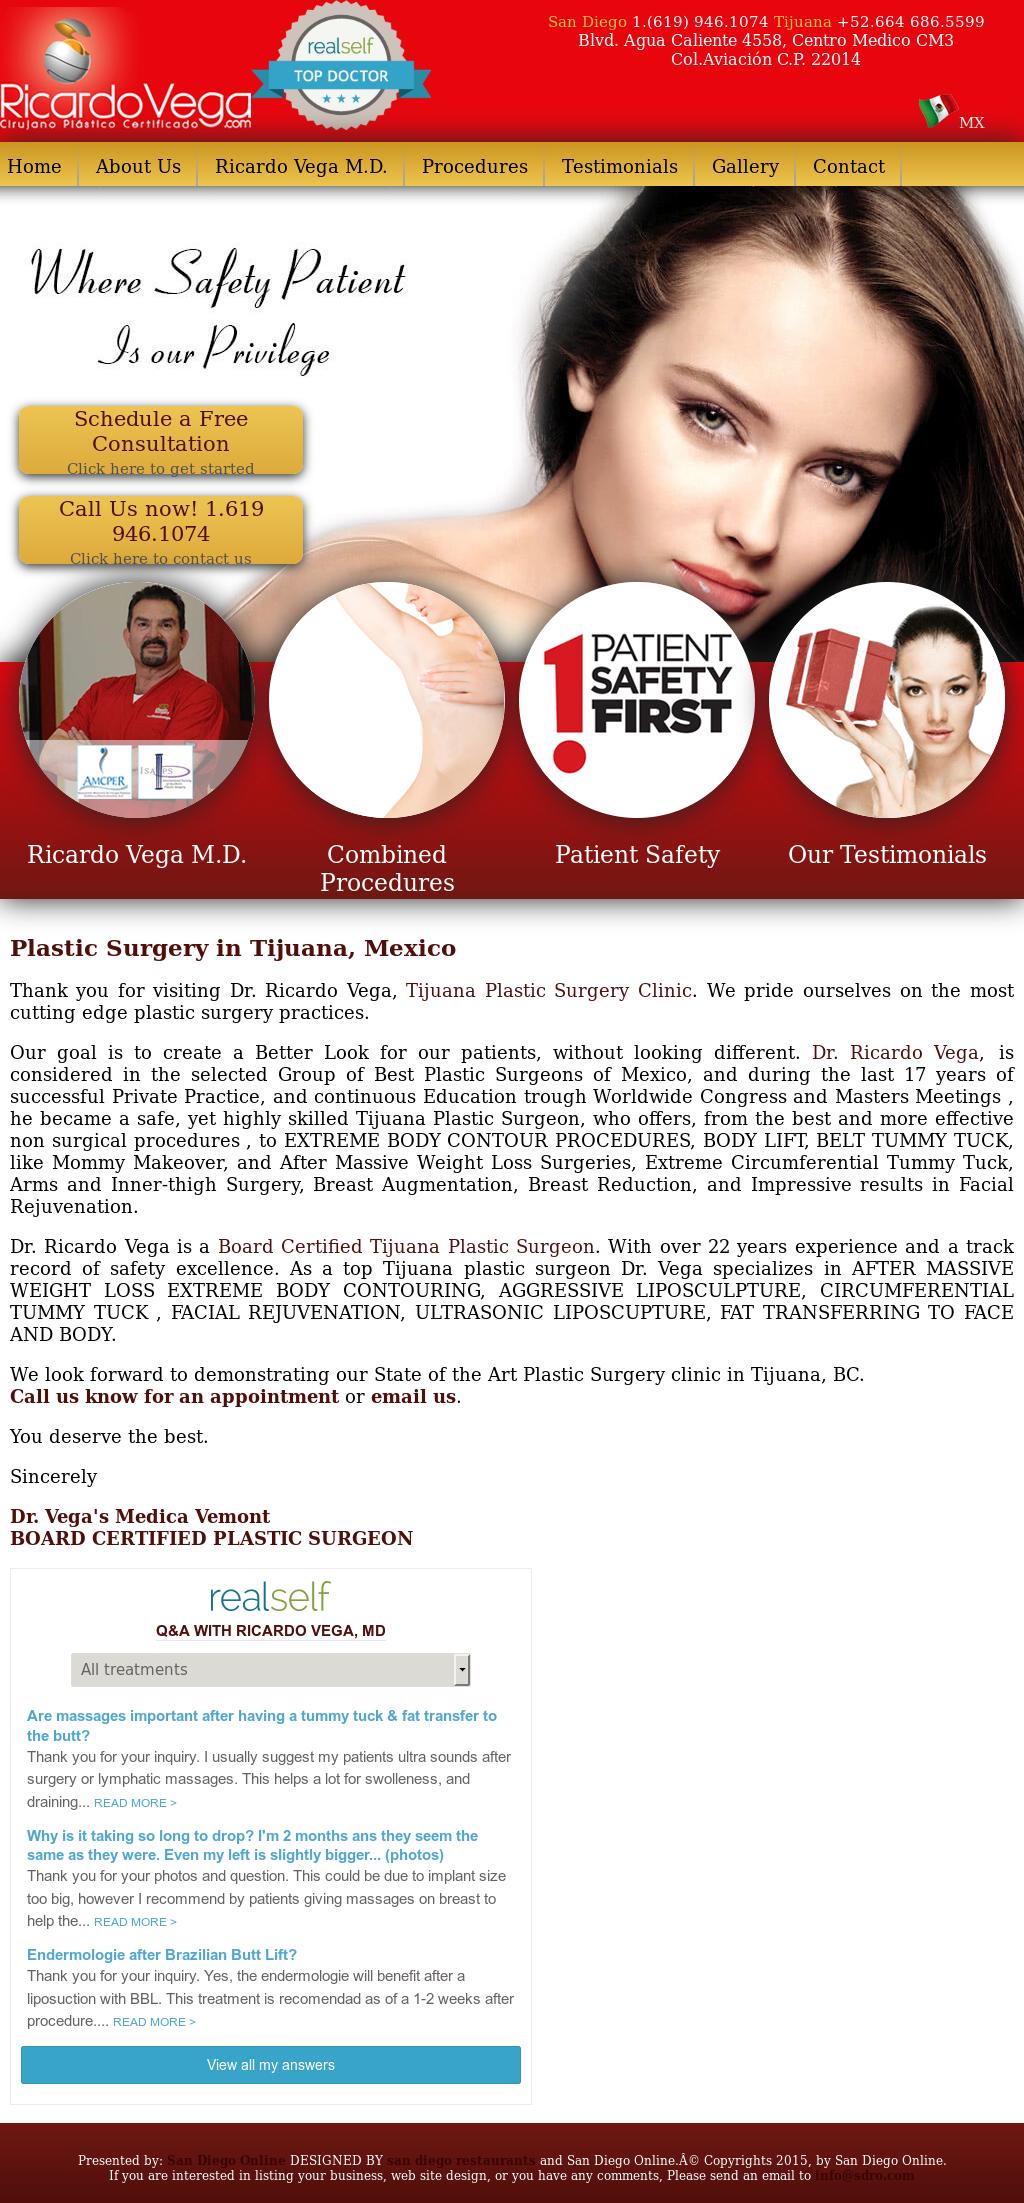 Dr Ricardo Vega - Plastic Surgery & Med Spa Competitors